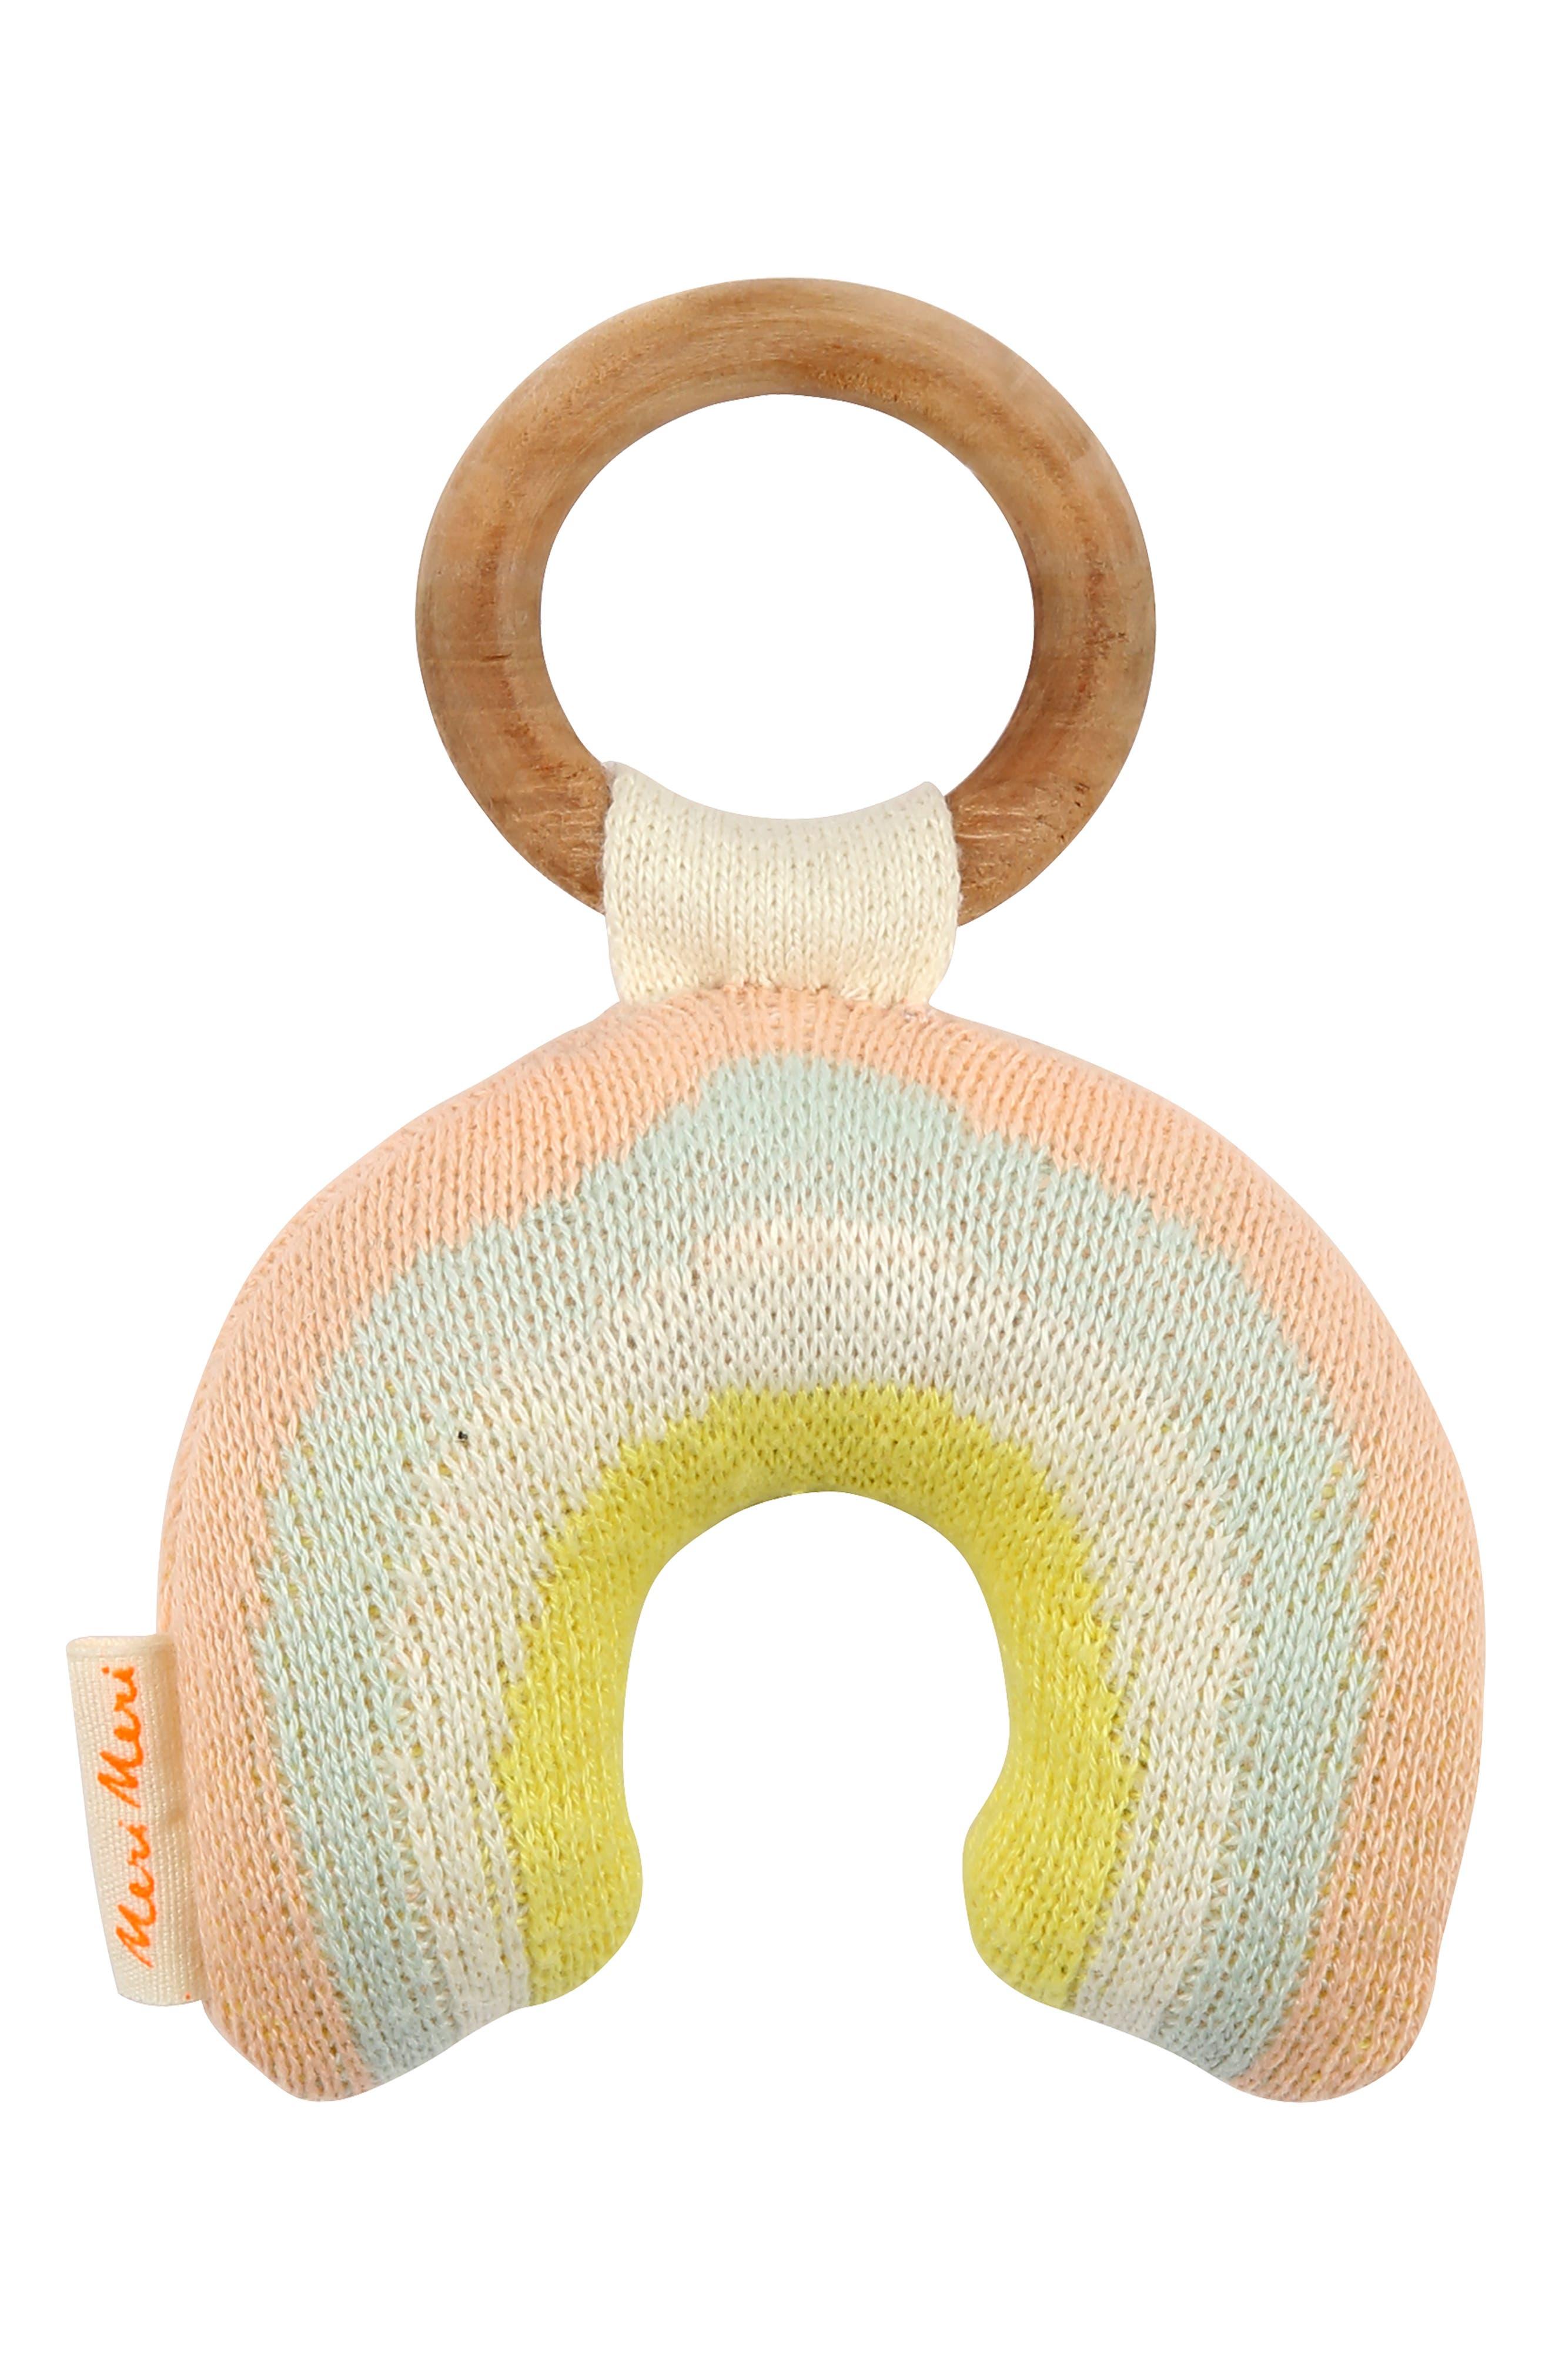 Rainbow Rattle,                         Main,                         color, 950